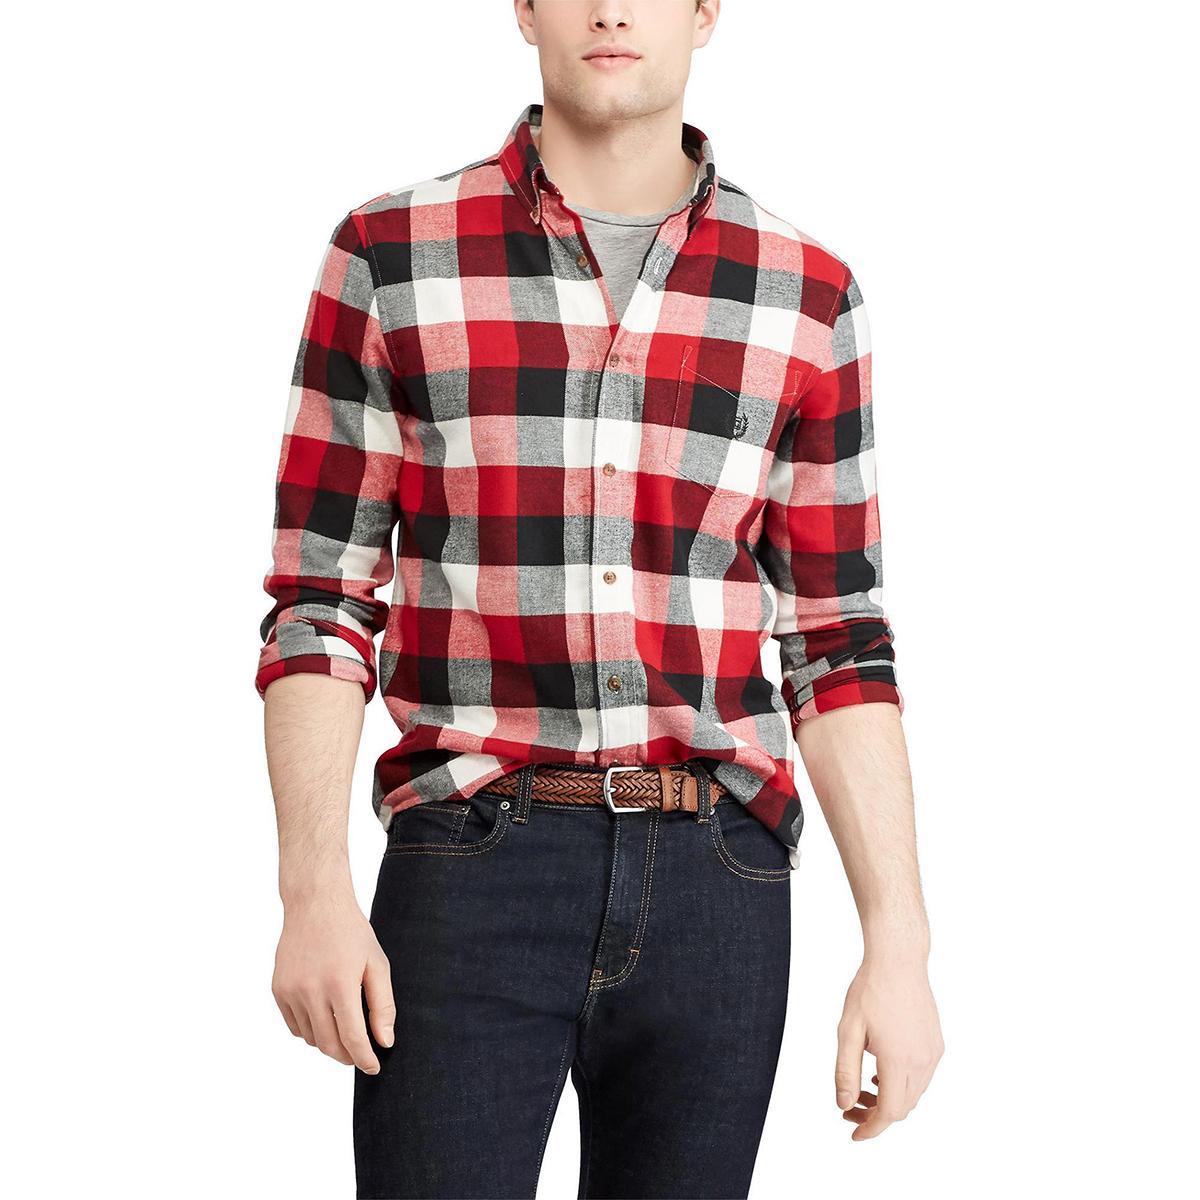 Chaps Men's Plaid Long-Sleeve Flannel Shirt - Red, M